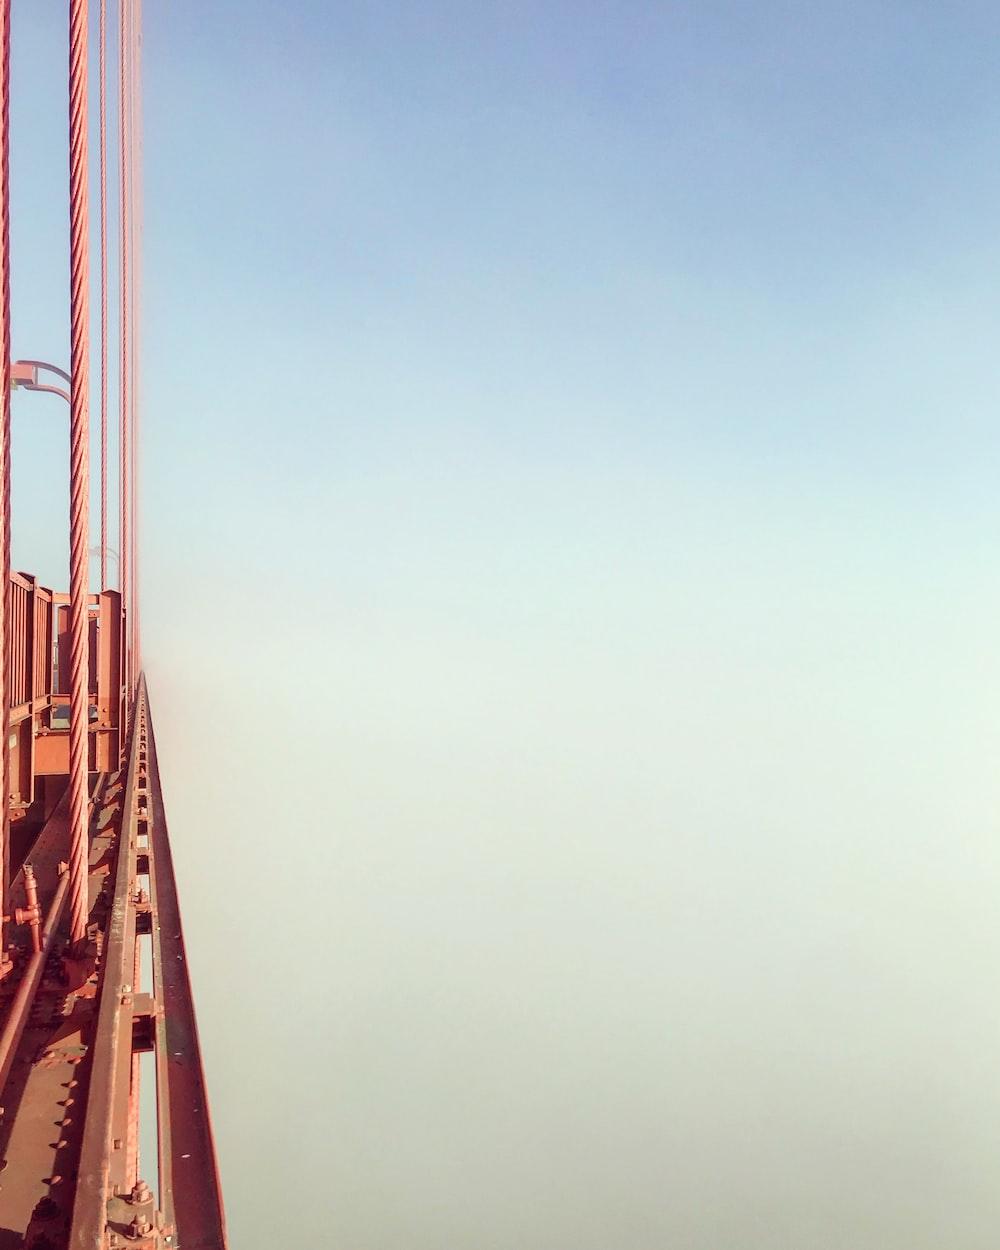 orange bridge frame